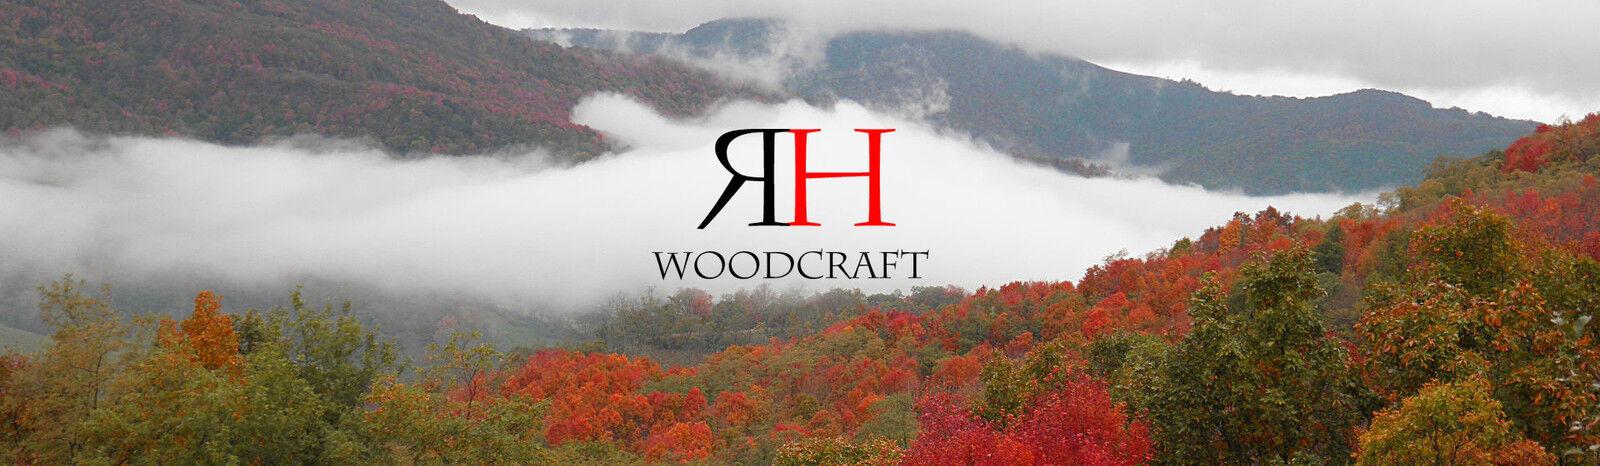 R H Woodcraft